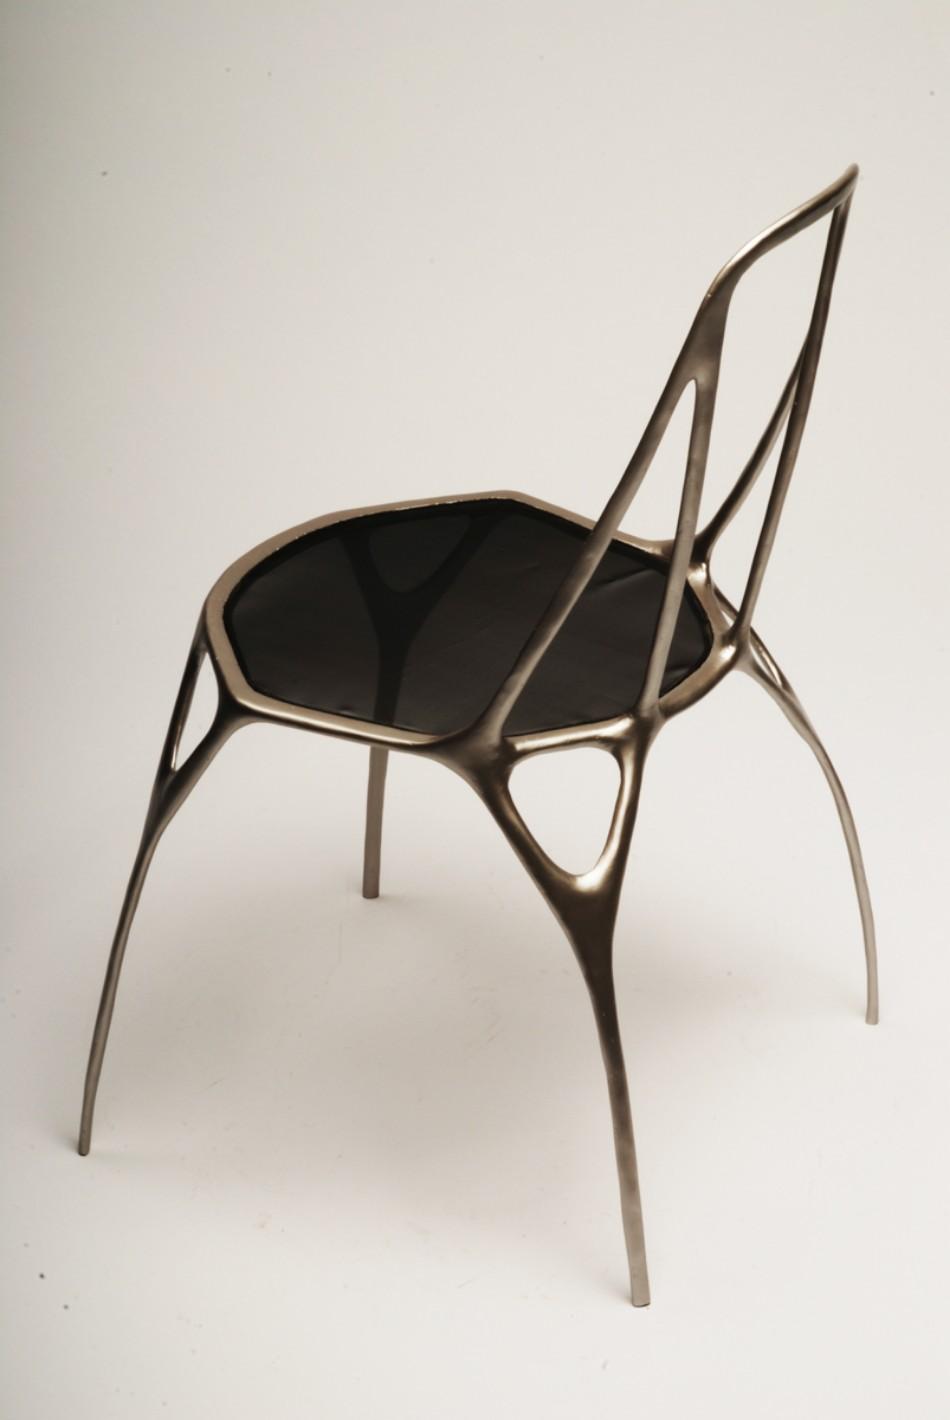 Benjamin Nordsmark Created Art From Modern Dining Chairs | www.bocadolobo.com #diningchairs #artisticchairs #artfurniture #thediningroom #diningarea #diningdesign #moderndiningtable @moderndiningtable